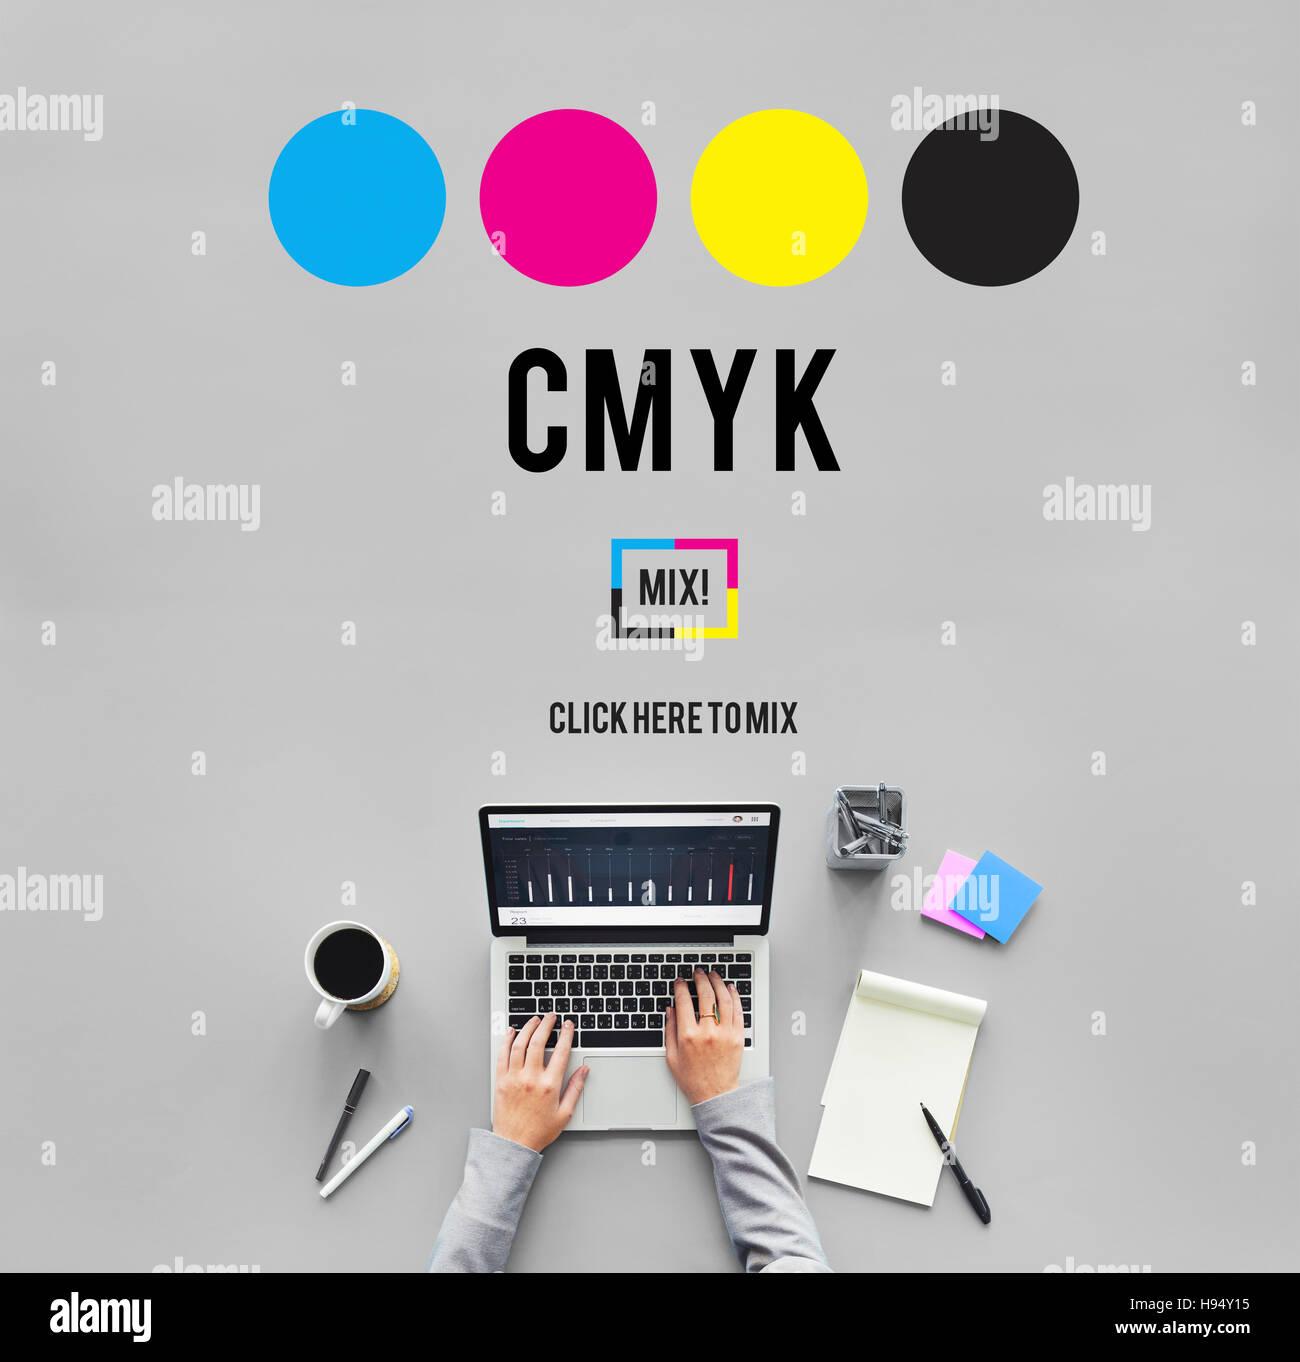 cmyk cyan magenta yellow key color printing process concept stock